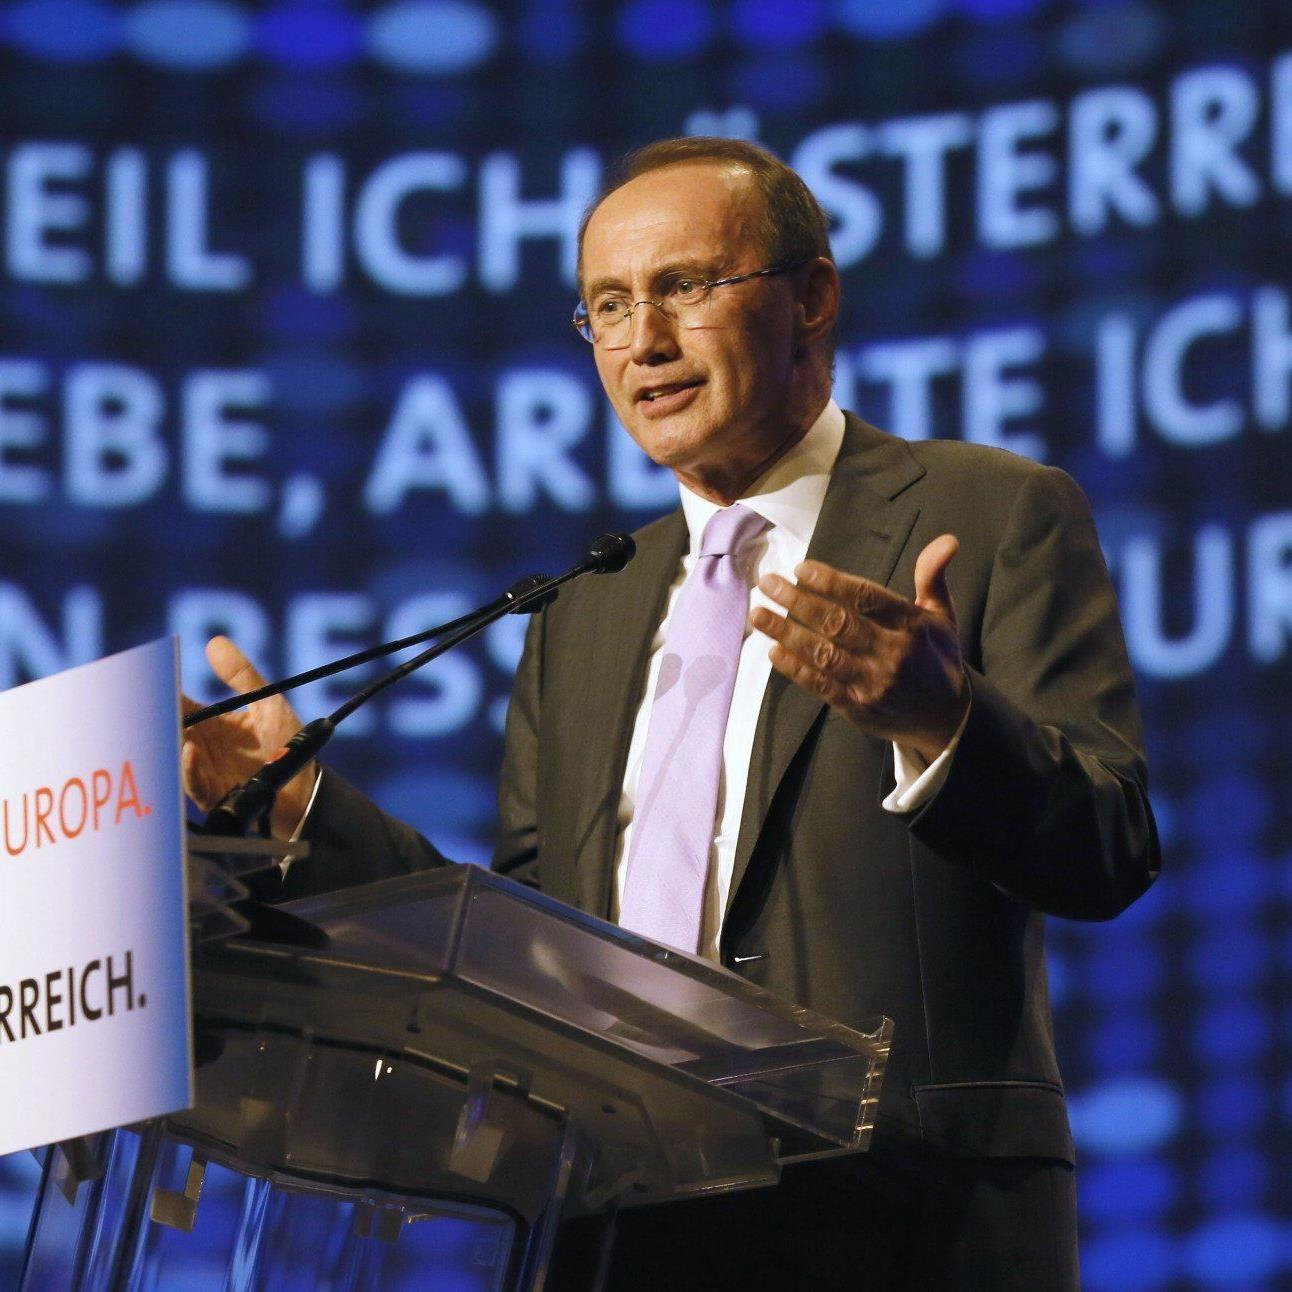 ÖVP-Spitzenkandidat Othmar Karas ist auch Vize-Präsident des Europäischen Parlaments.